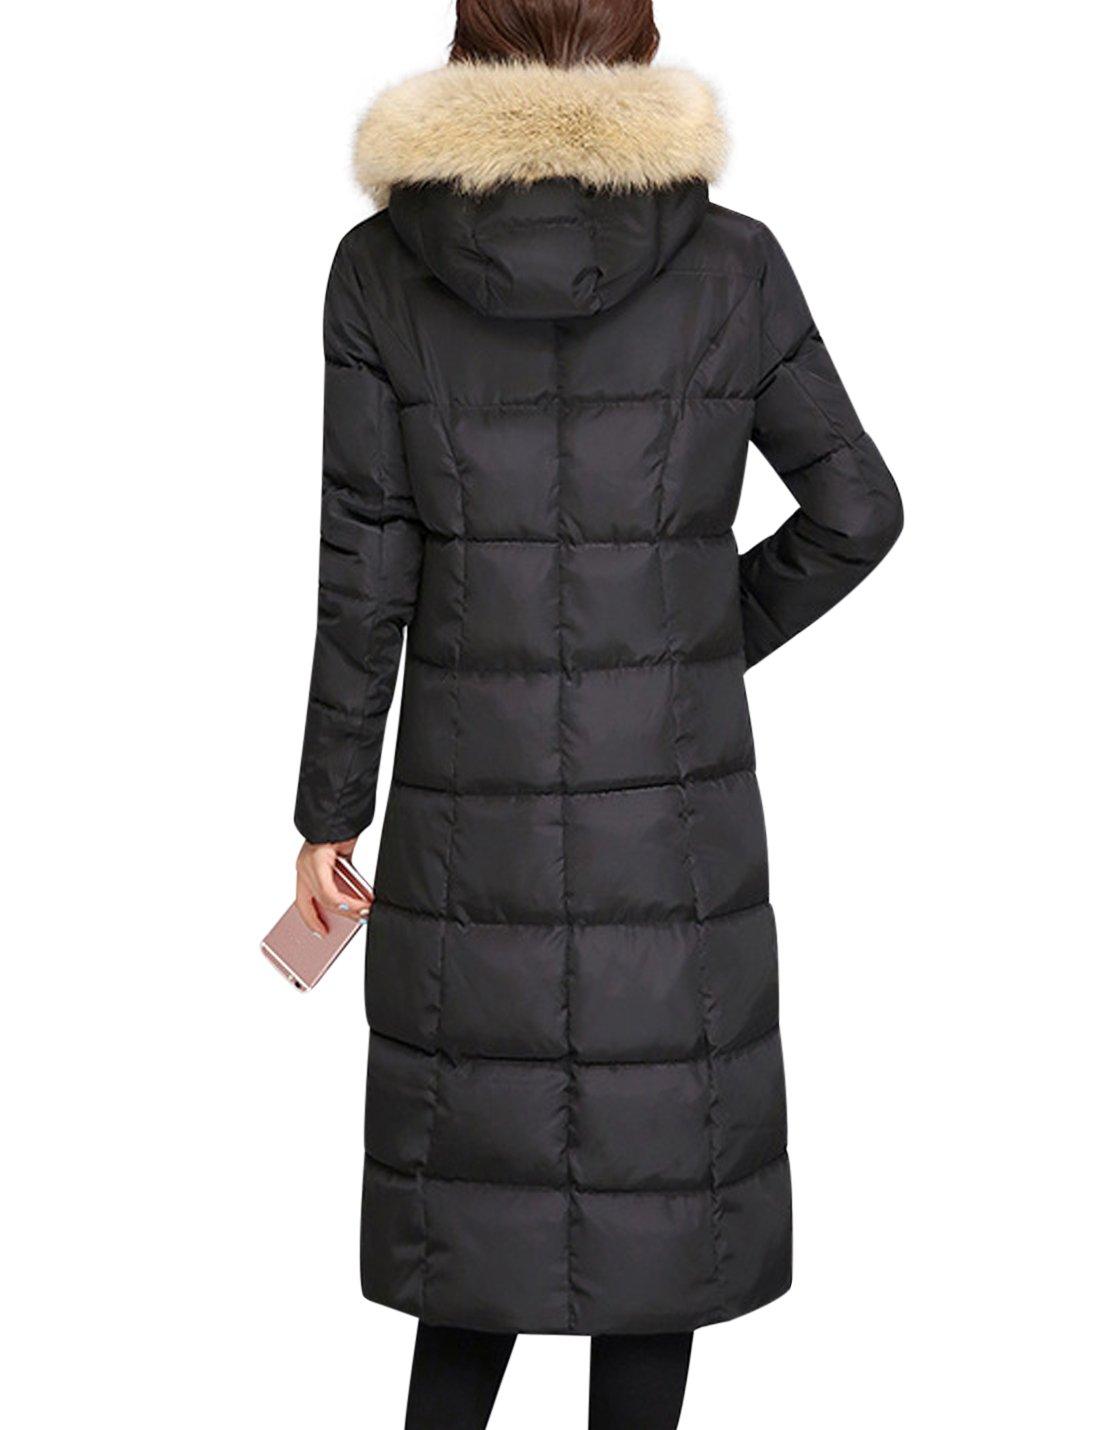 Tanming Women's Winter Cotton Padded Long Coat Outerwear With Fur Trim Hood (Large, Black) by Tanming (Image #2)